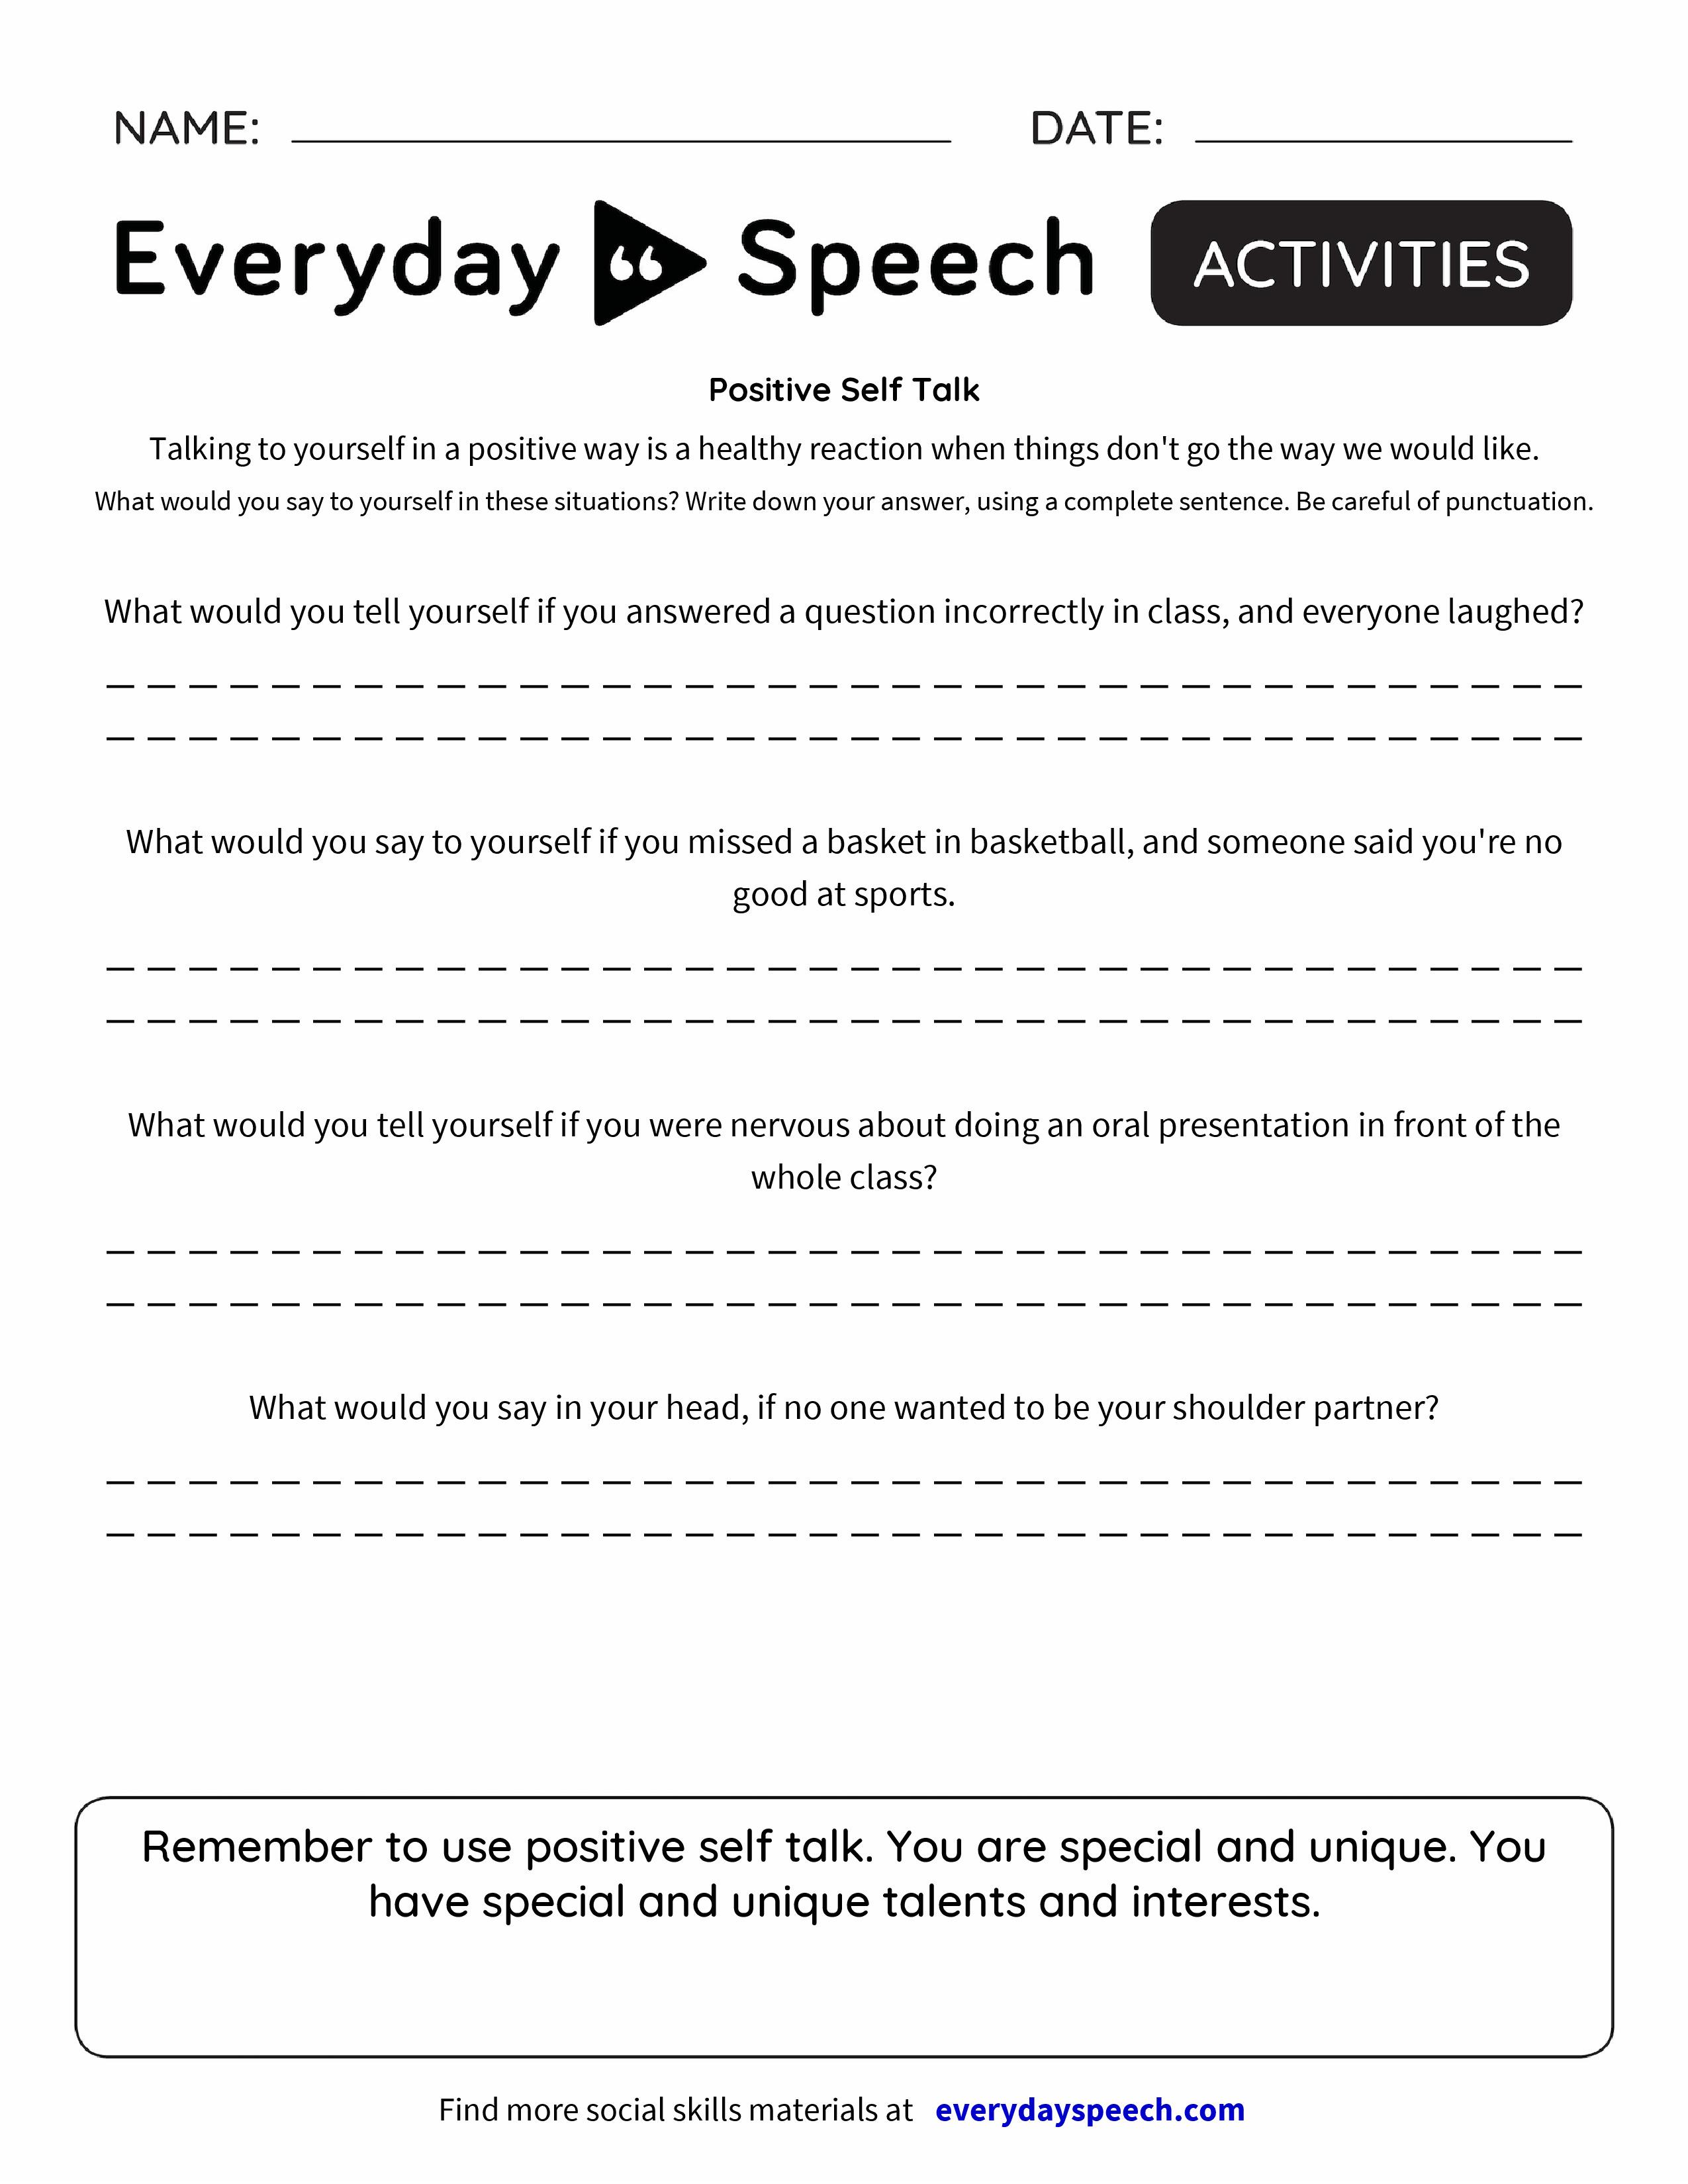 Worksheets Positive Self Talk Worksheet positive self talk everyday speech preview preview